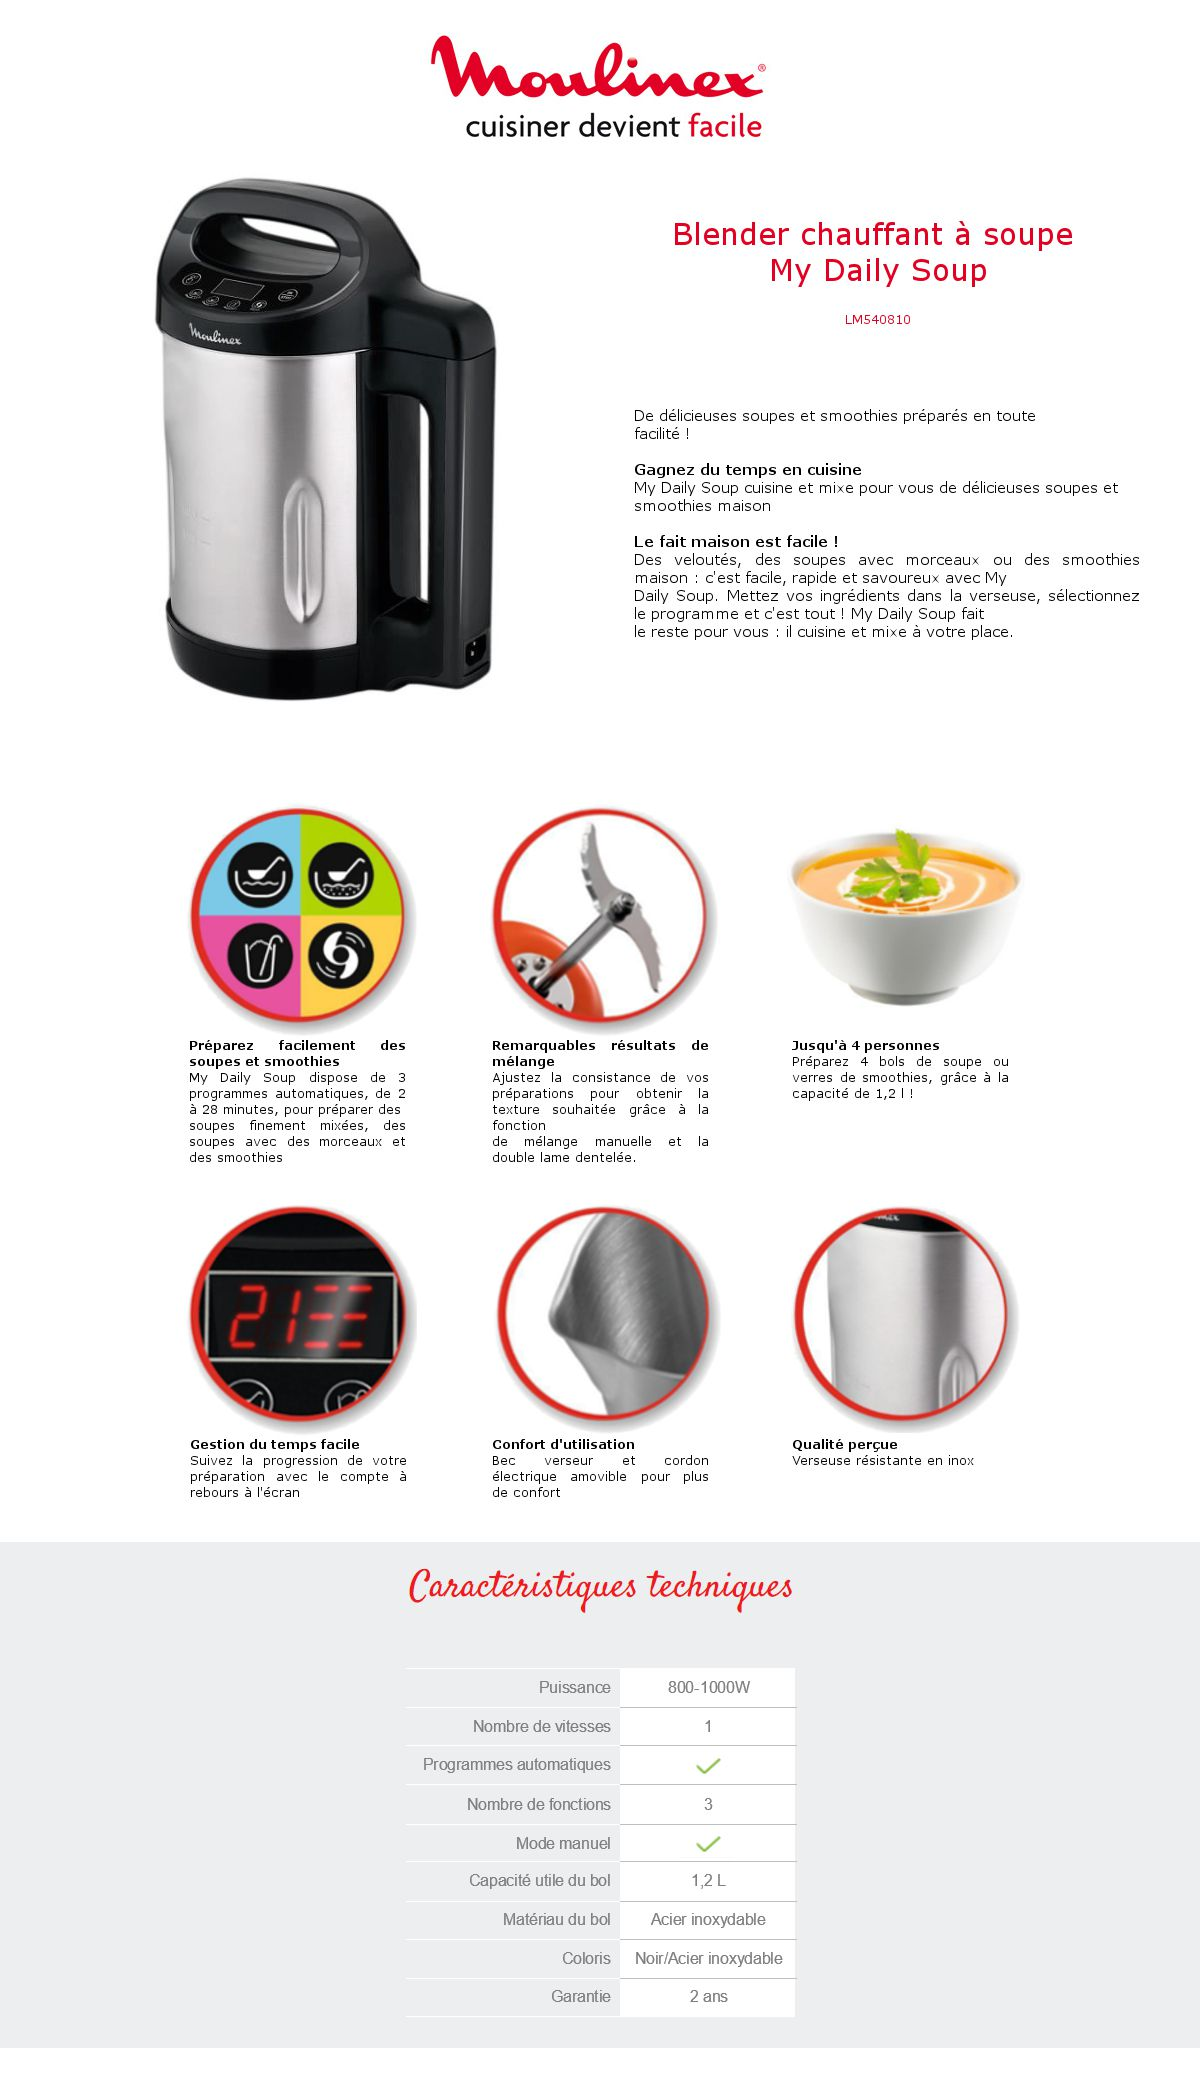 moulinex blender chauffant 1 2l lm540810 my daily soup maker inox noir achat vente. Black Bedroom Furniture Sets. Home Design Ideas